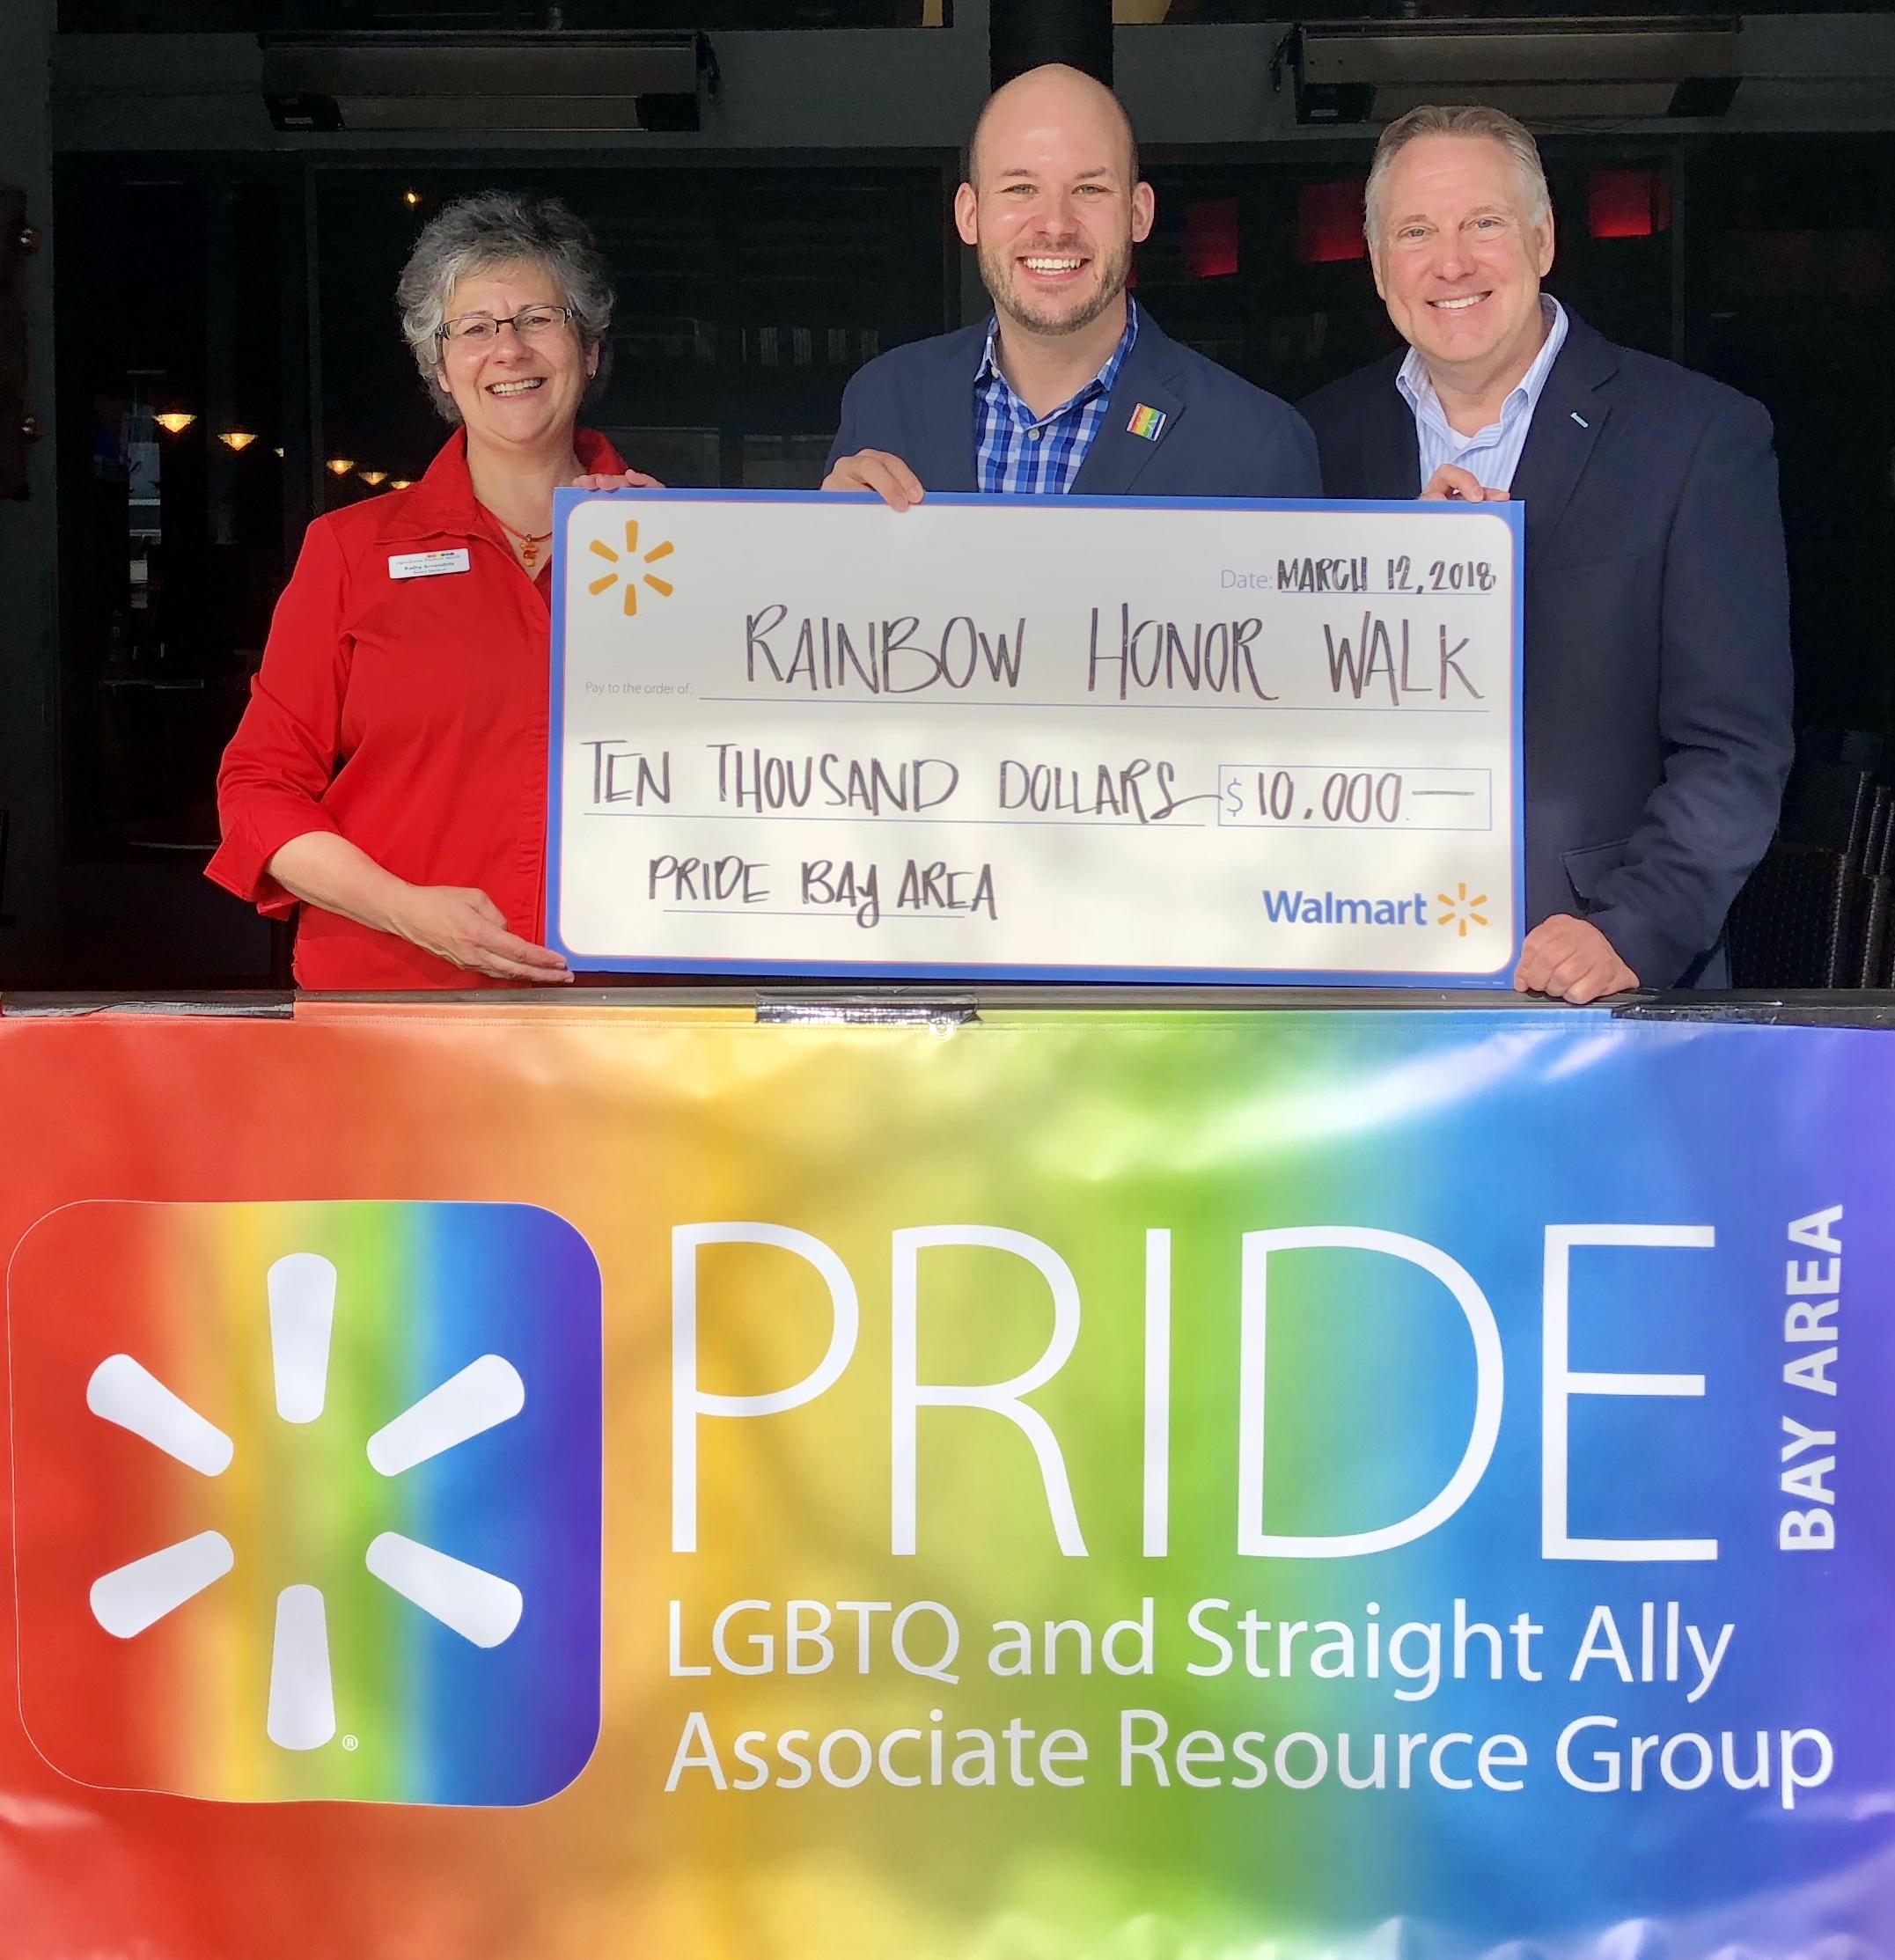 Walmart PRIDE Associate Resource Group donates $10,000 to